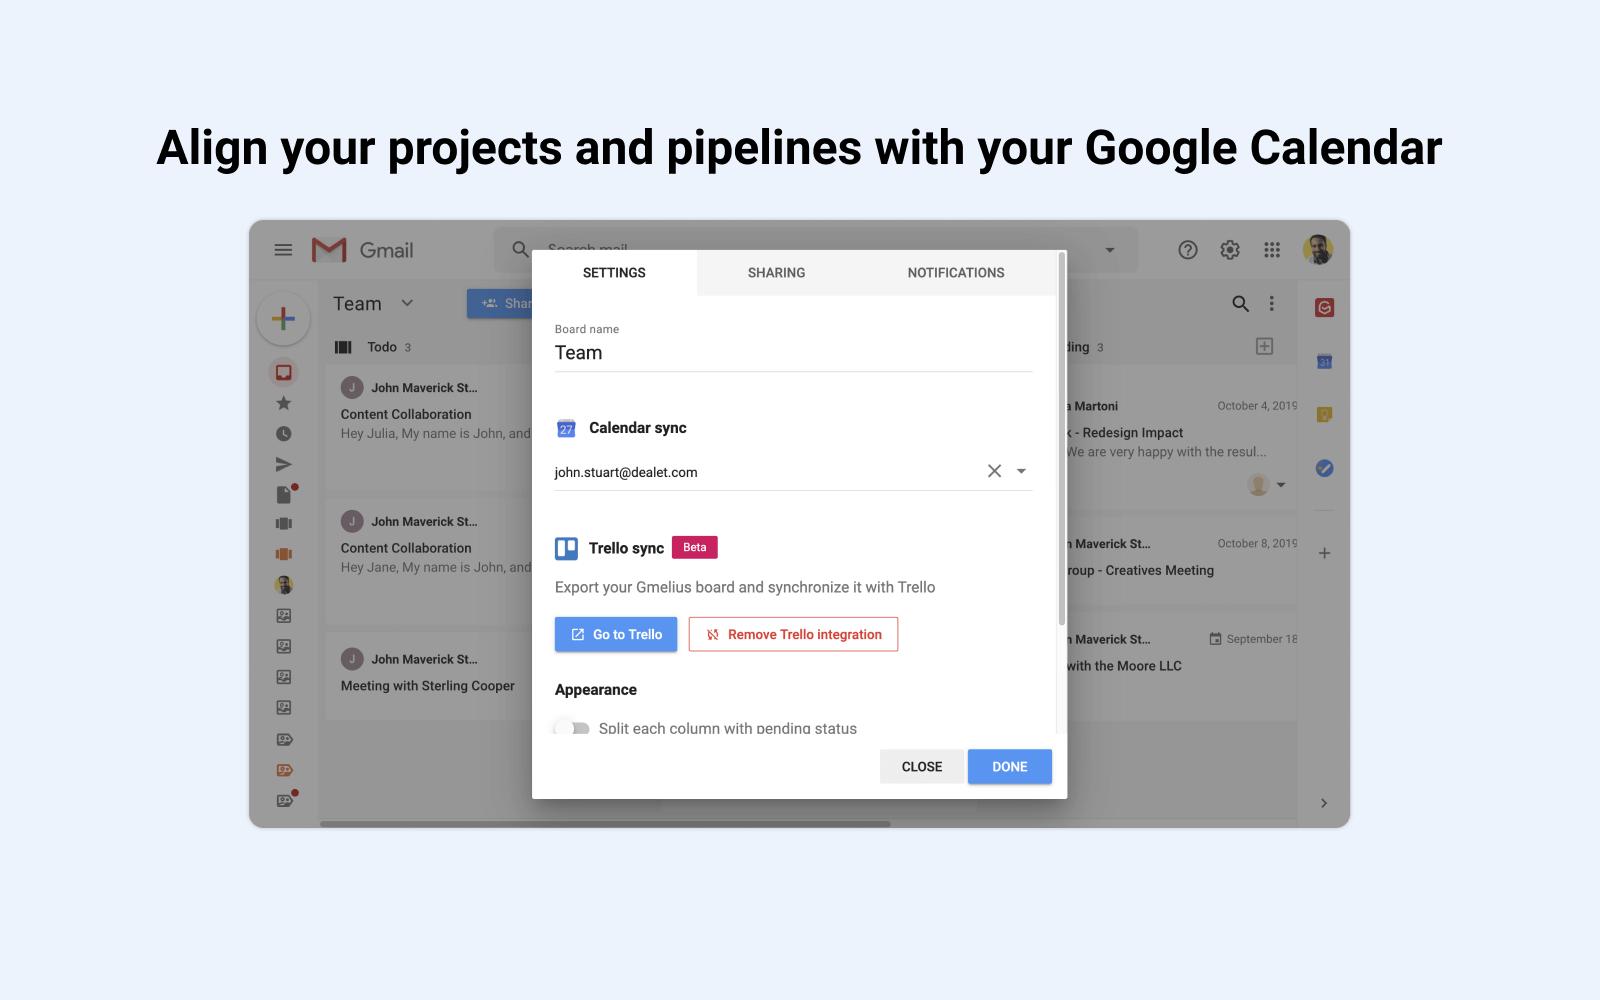 Aligner les projets sur Google Calendar